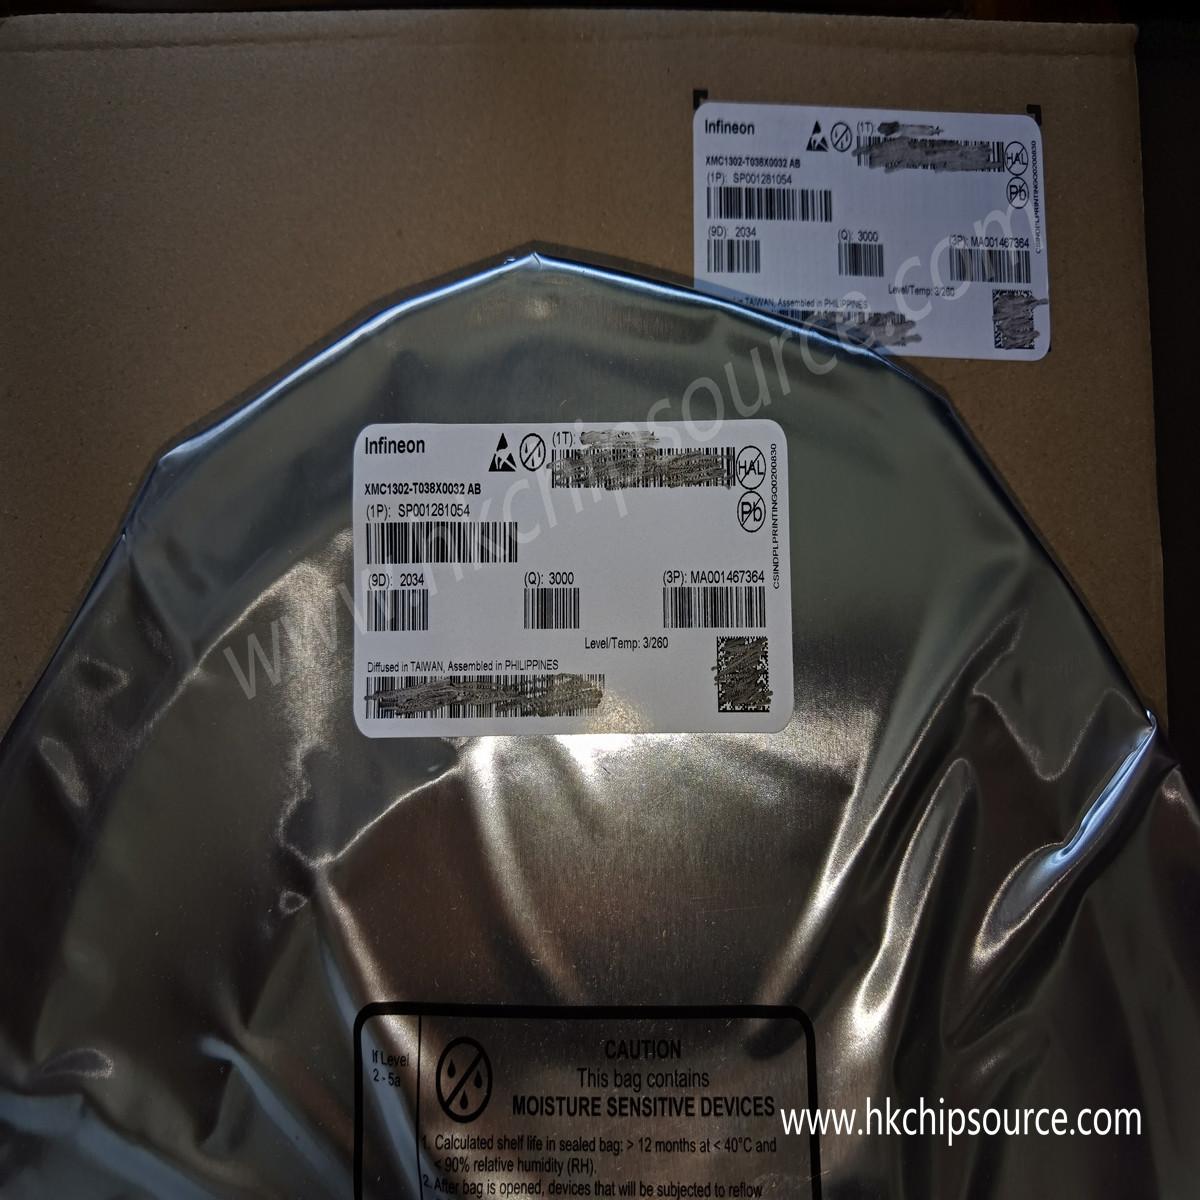 XMC1302T038X0032ABXUMA1 Images